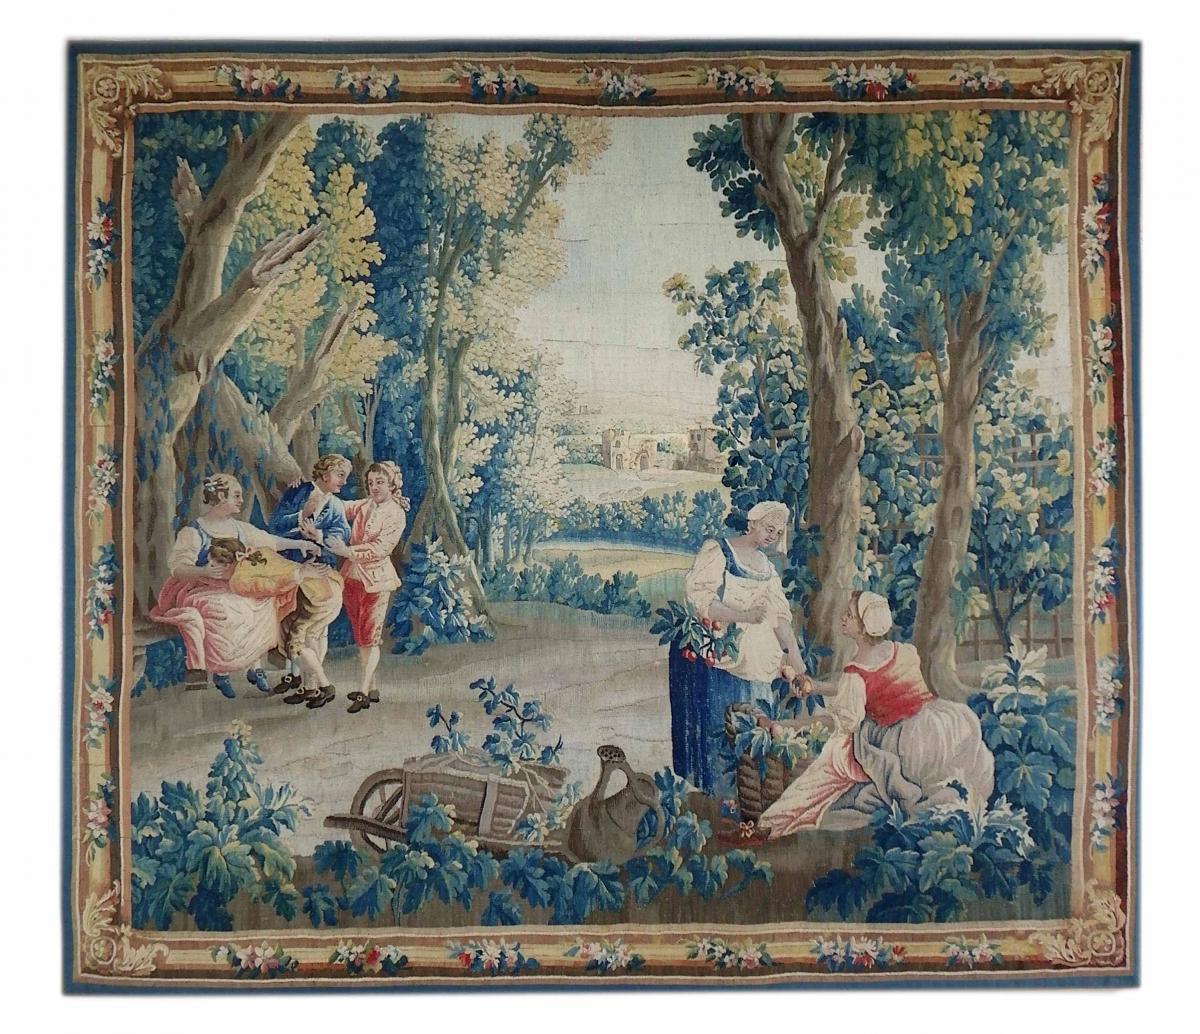 Tapisserie Aubusson XVIII Scène Bucolique